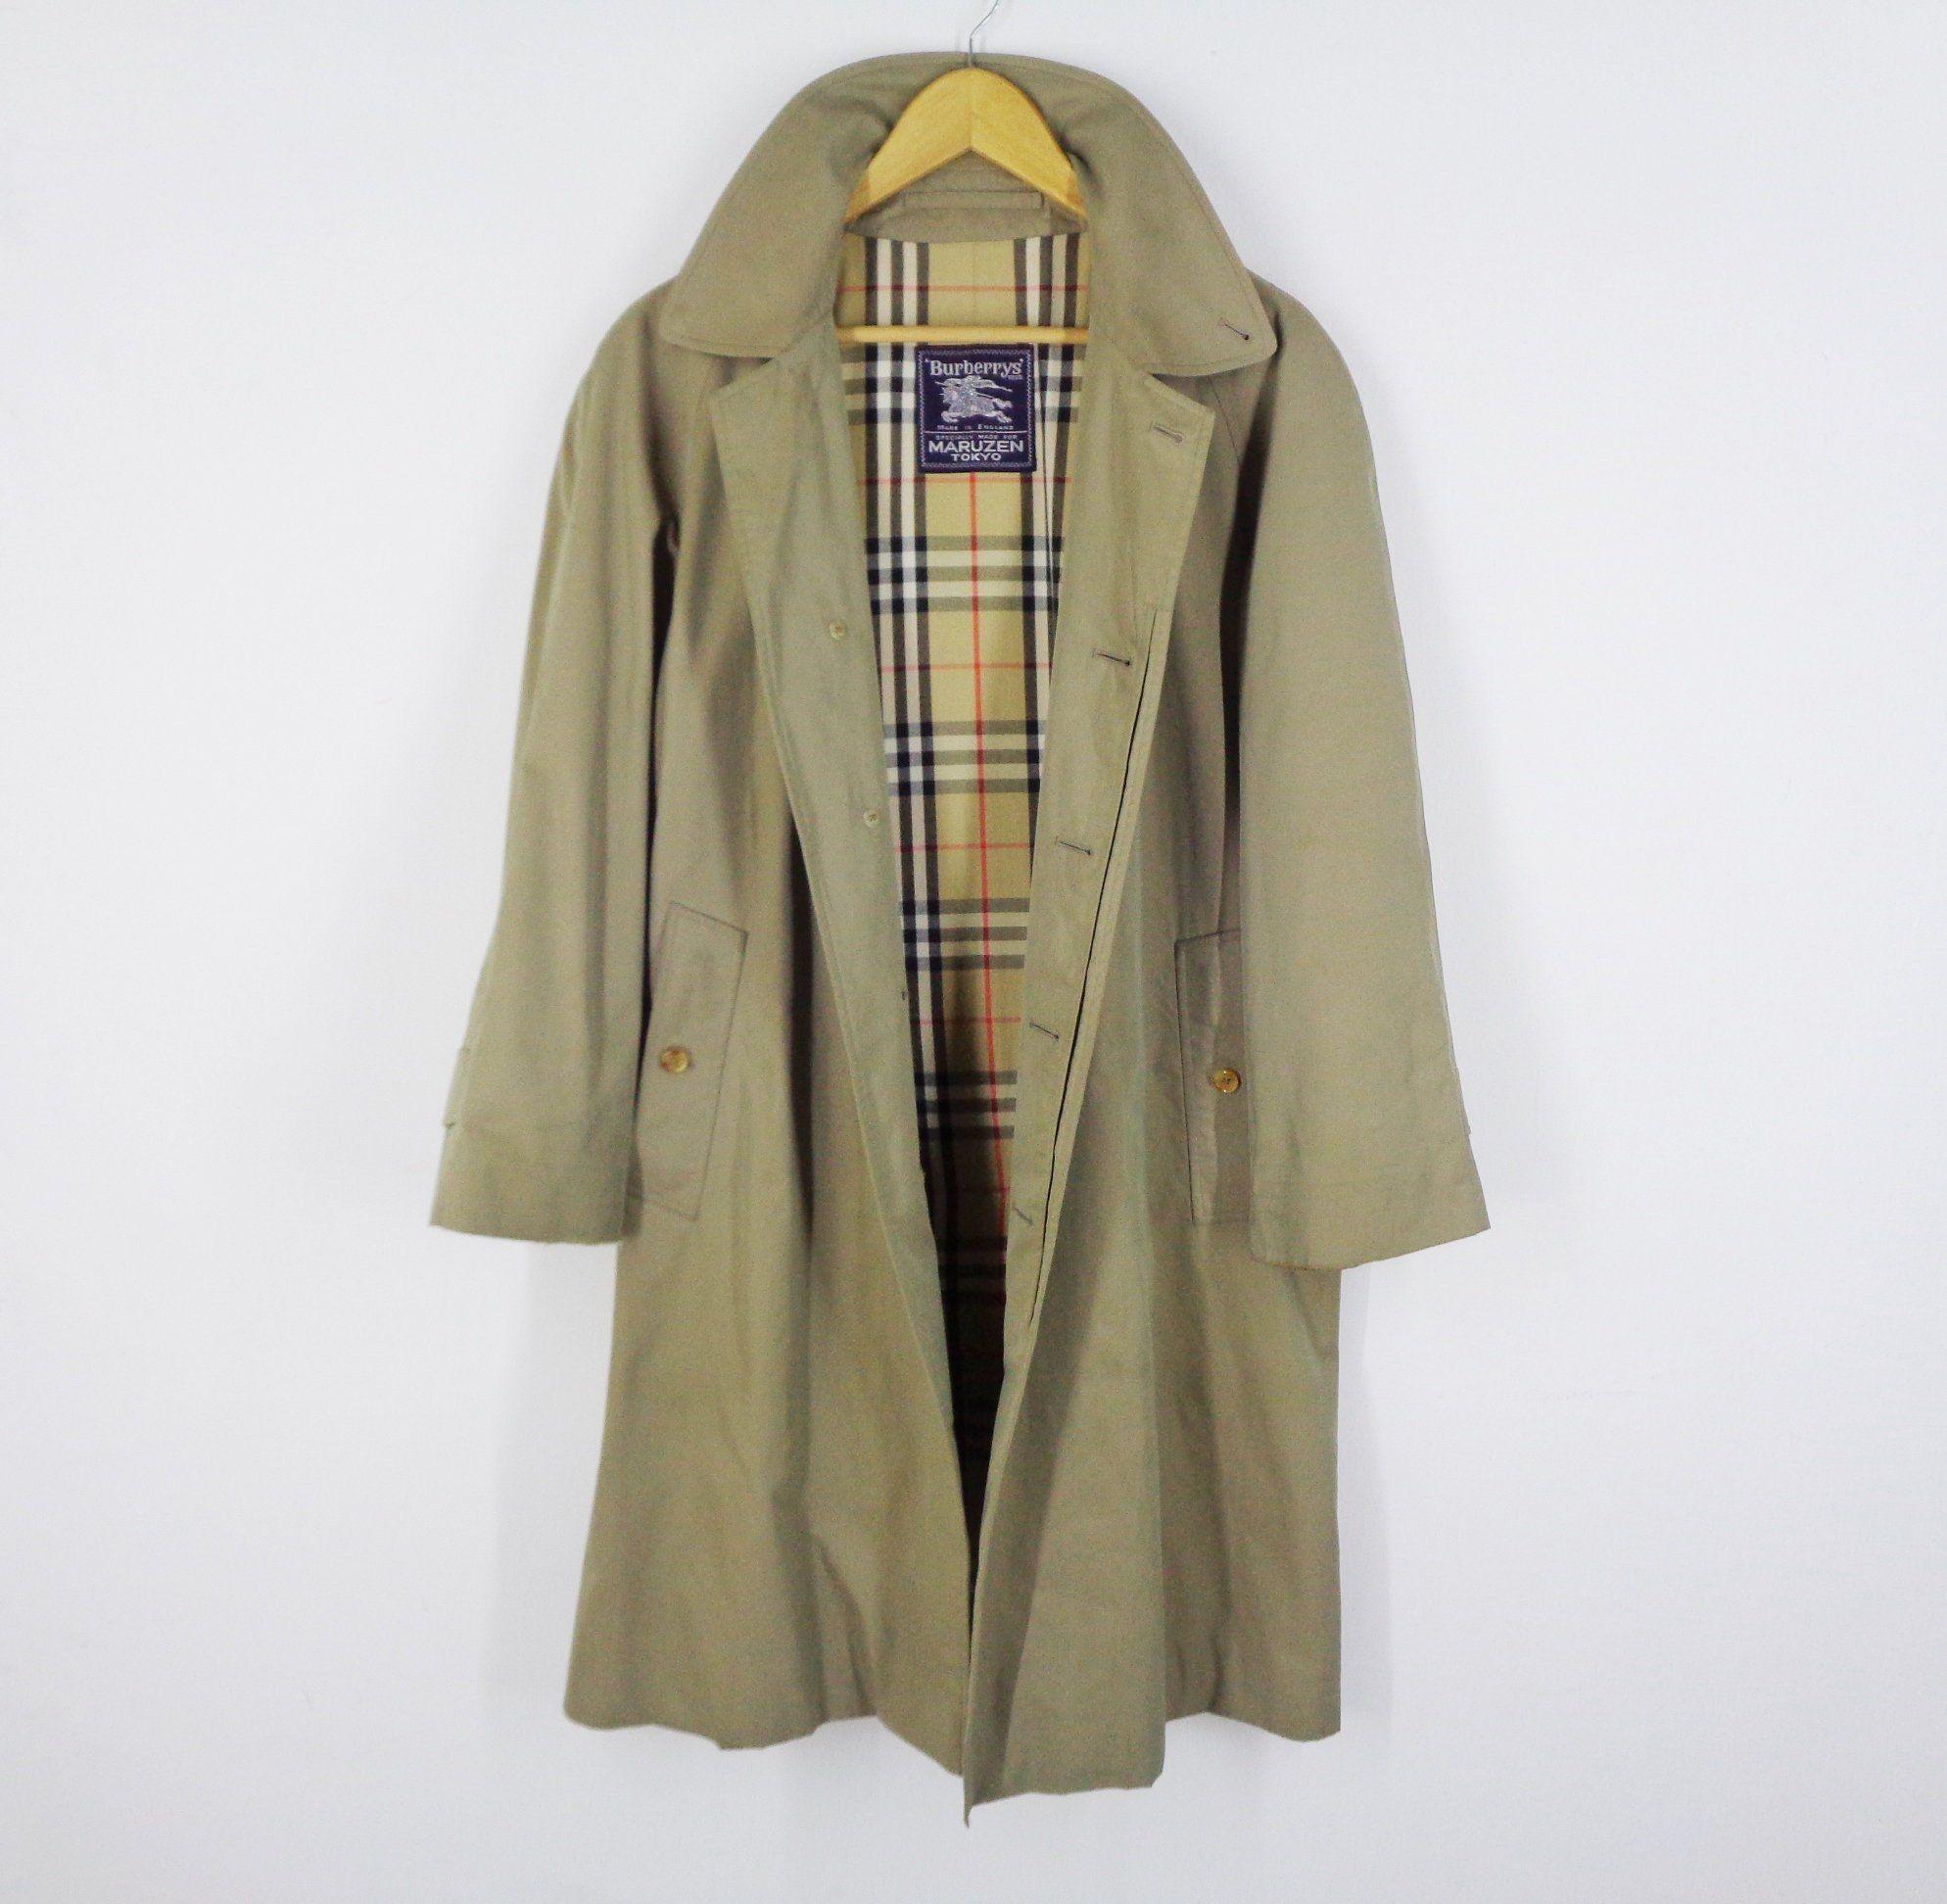 Burberrys Jacket Vintage 90 S Burberrys Specially Made For Maruzen Tokyo Nova Check Trench Coat Burberrys Vintage Made In Engla Coat Vintage Coat Used Clothing